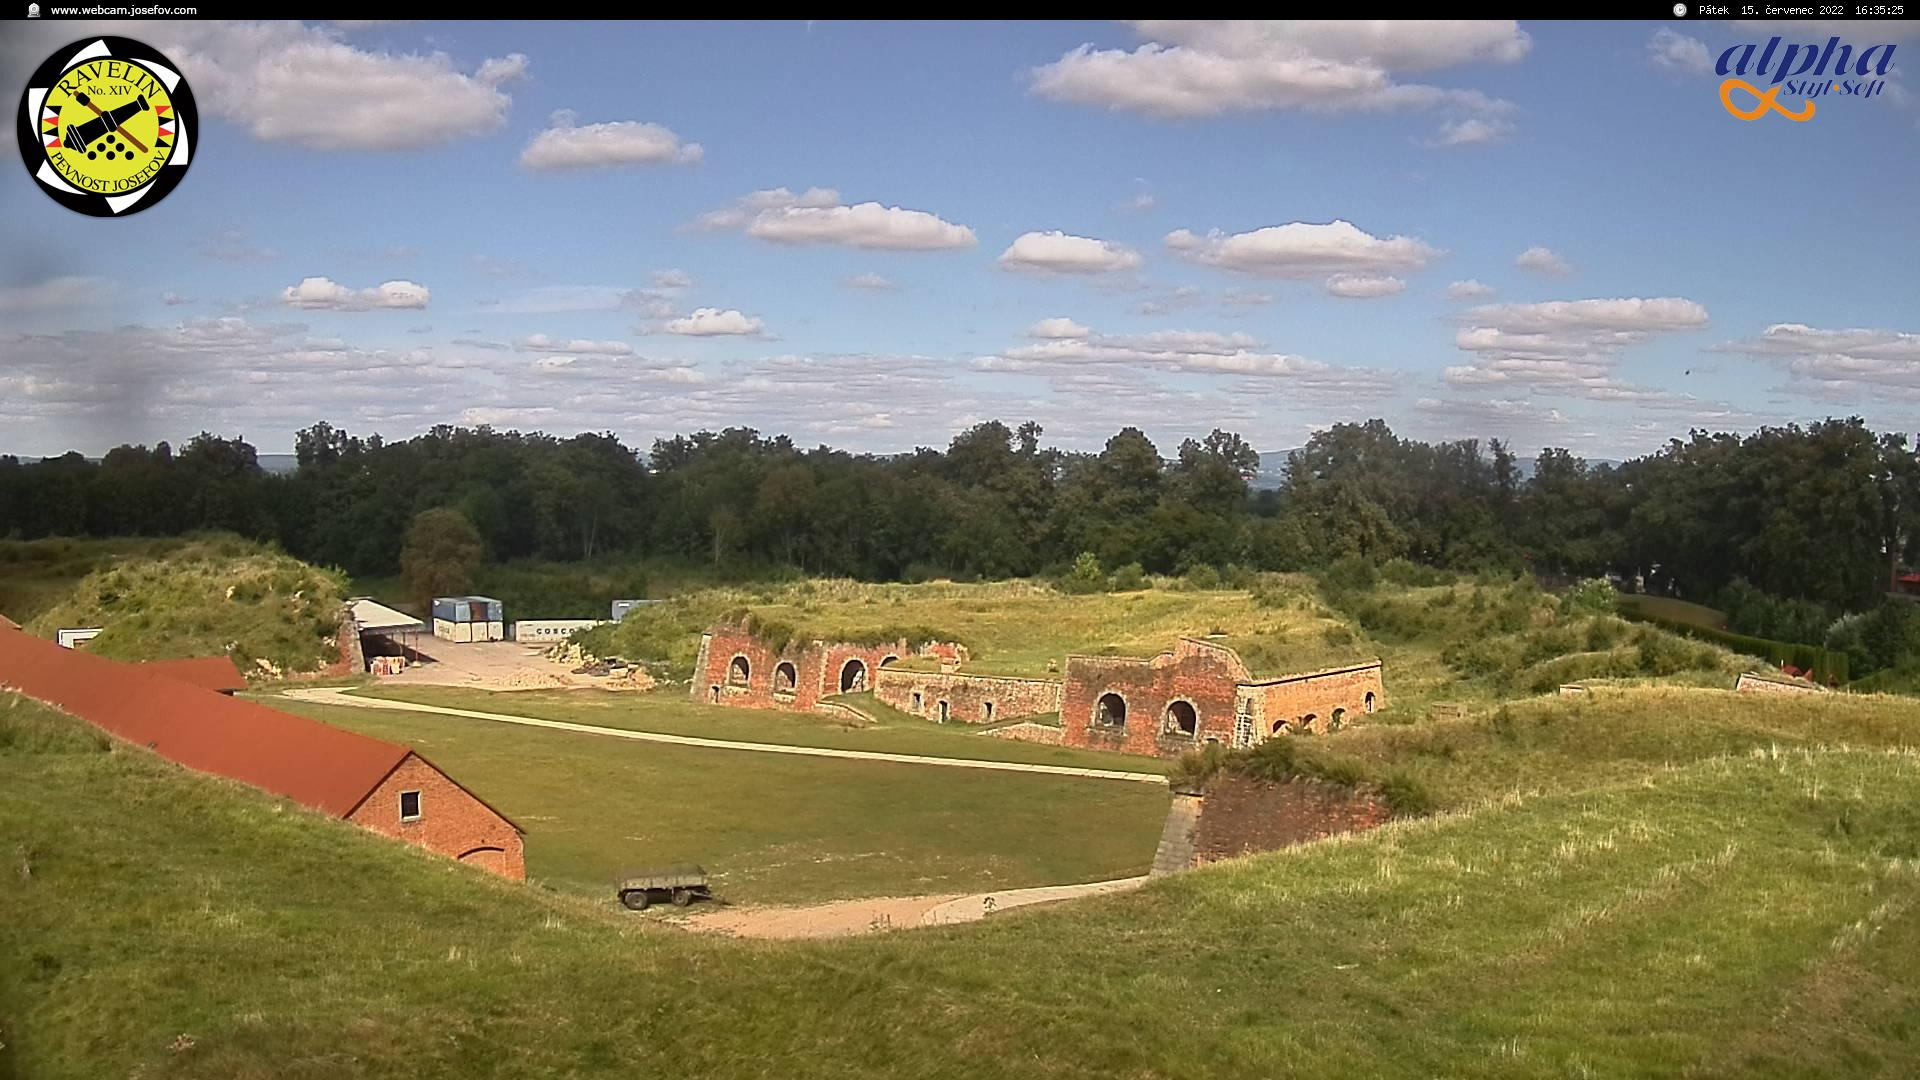 Webkamera Ravelin no. XIV